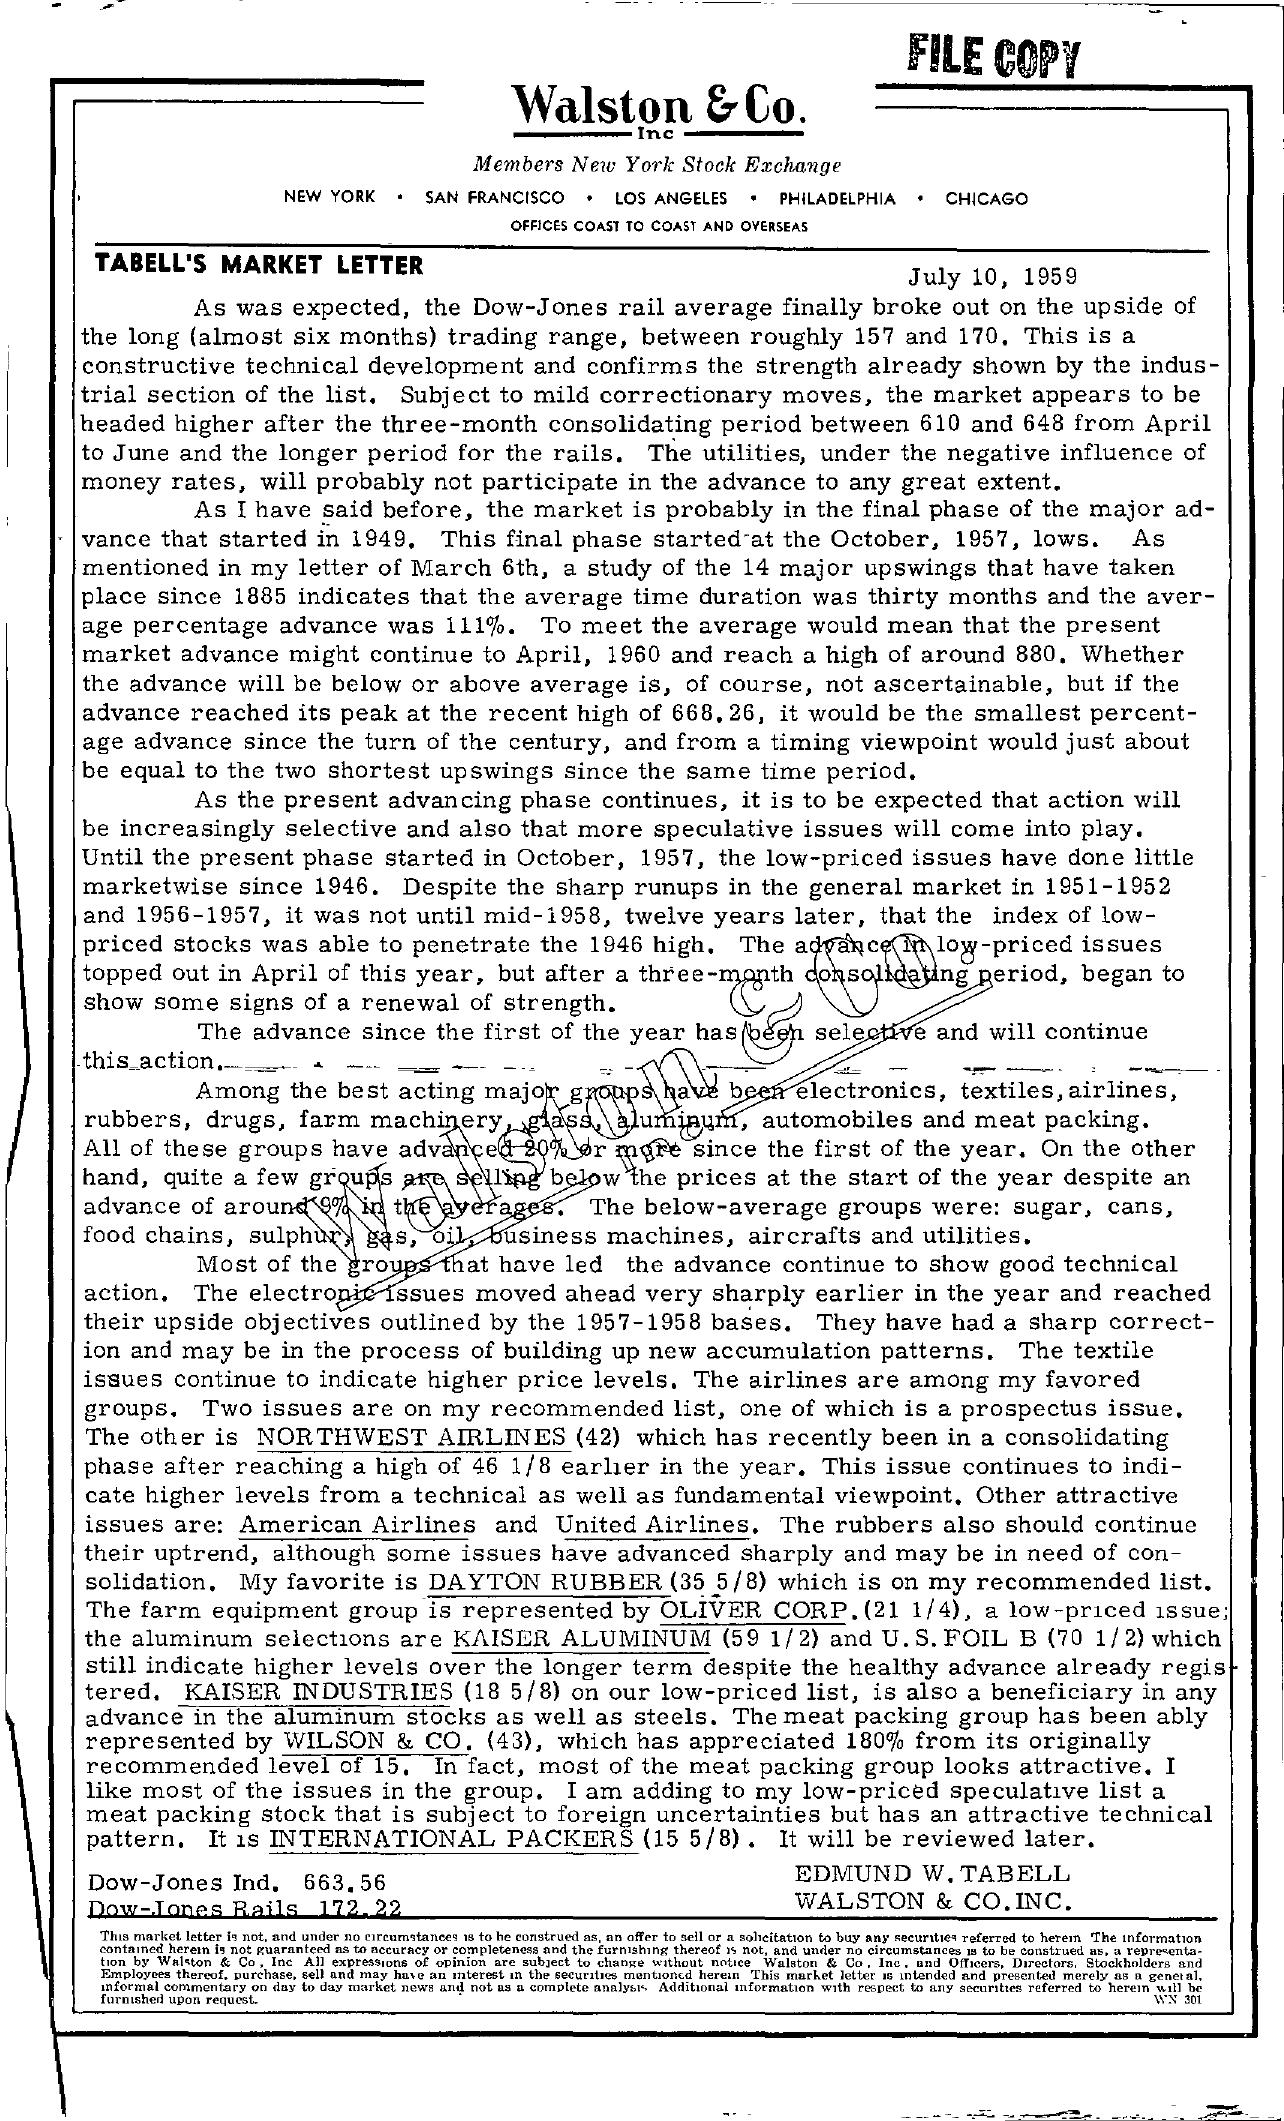 Tabell's Market Letter - July 10, 1959